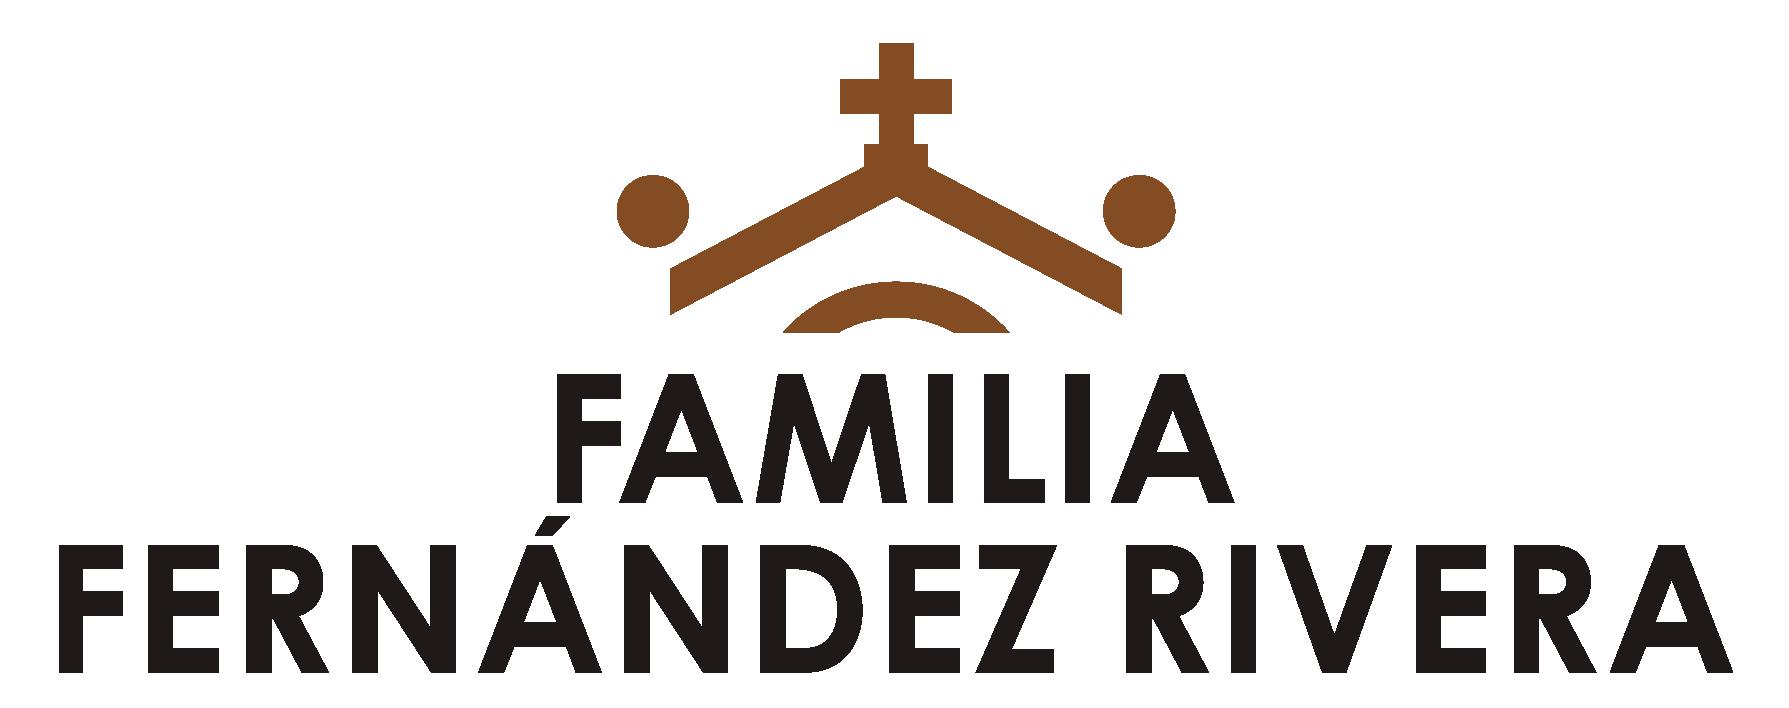 Hotel-Envero-bodega-Familia-Fernandez-Rivera-LOGO